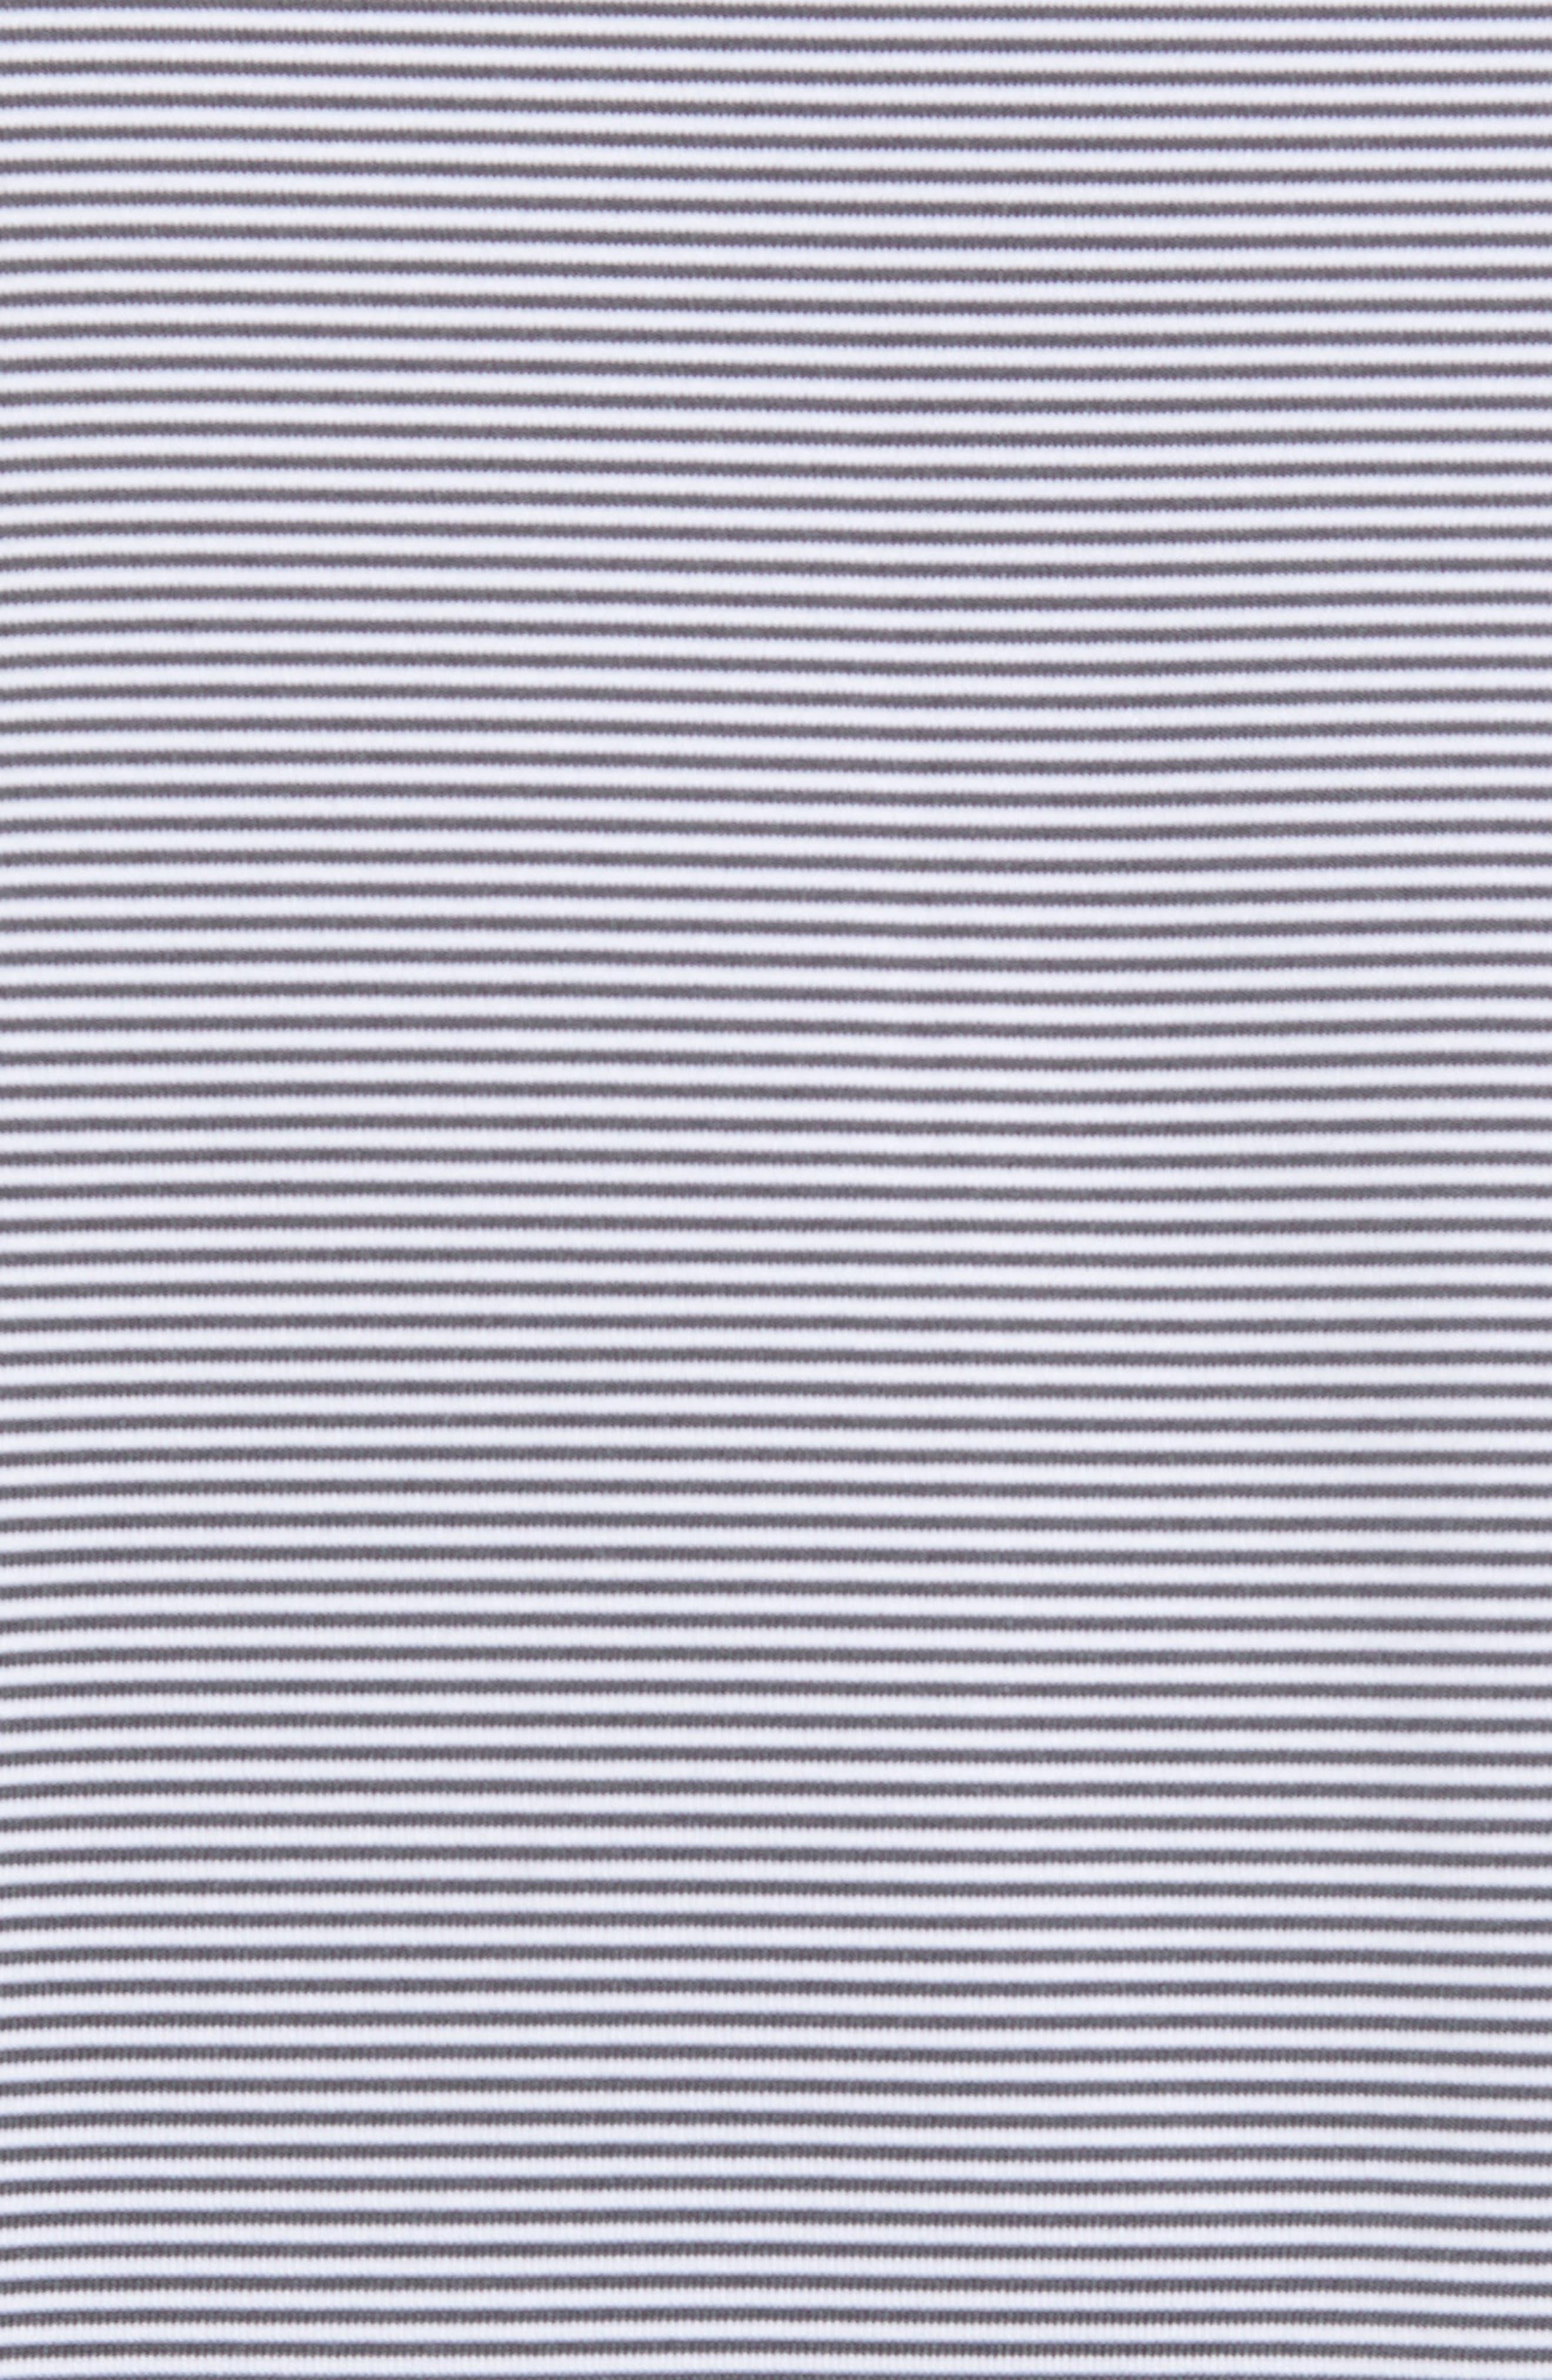 Jubilee Stripe Stretch Jersey Performance Polo,                             Alternate thumbnail 5, color,                             020